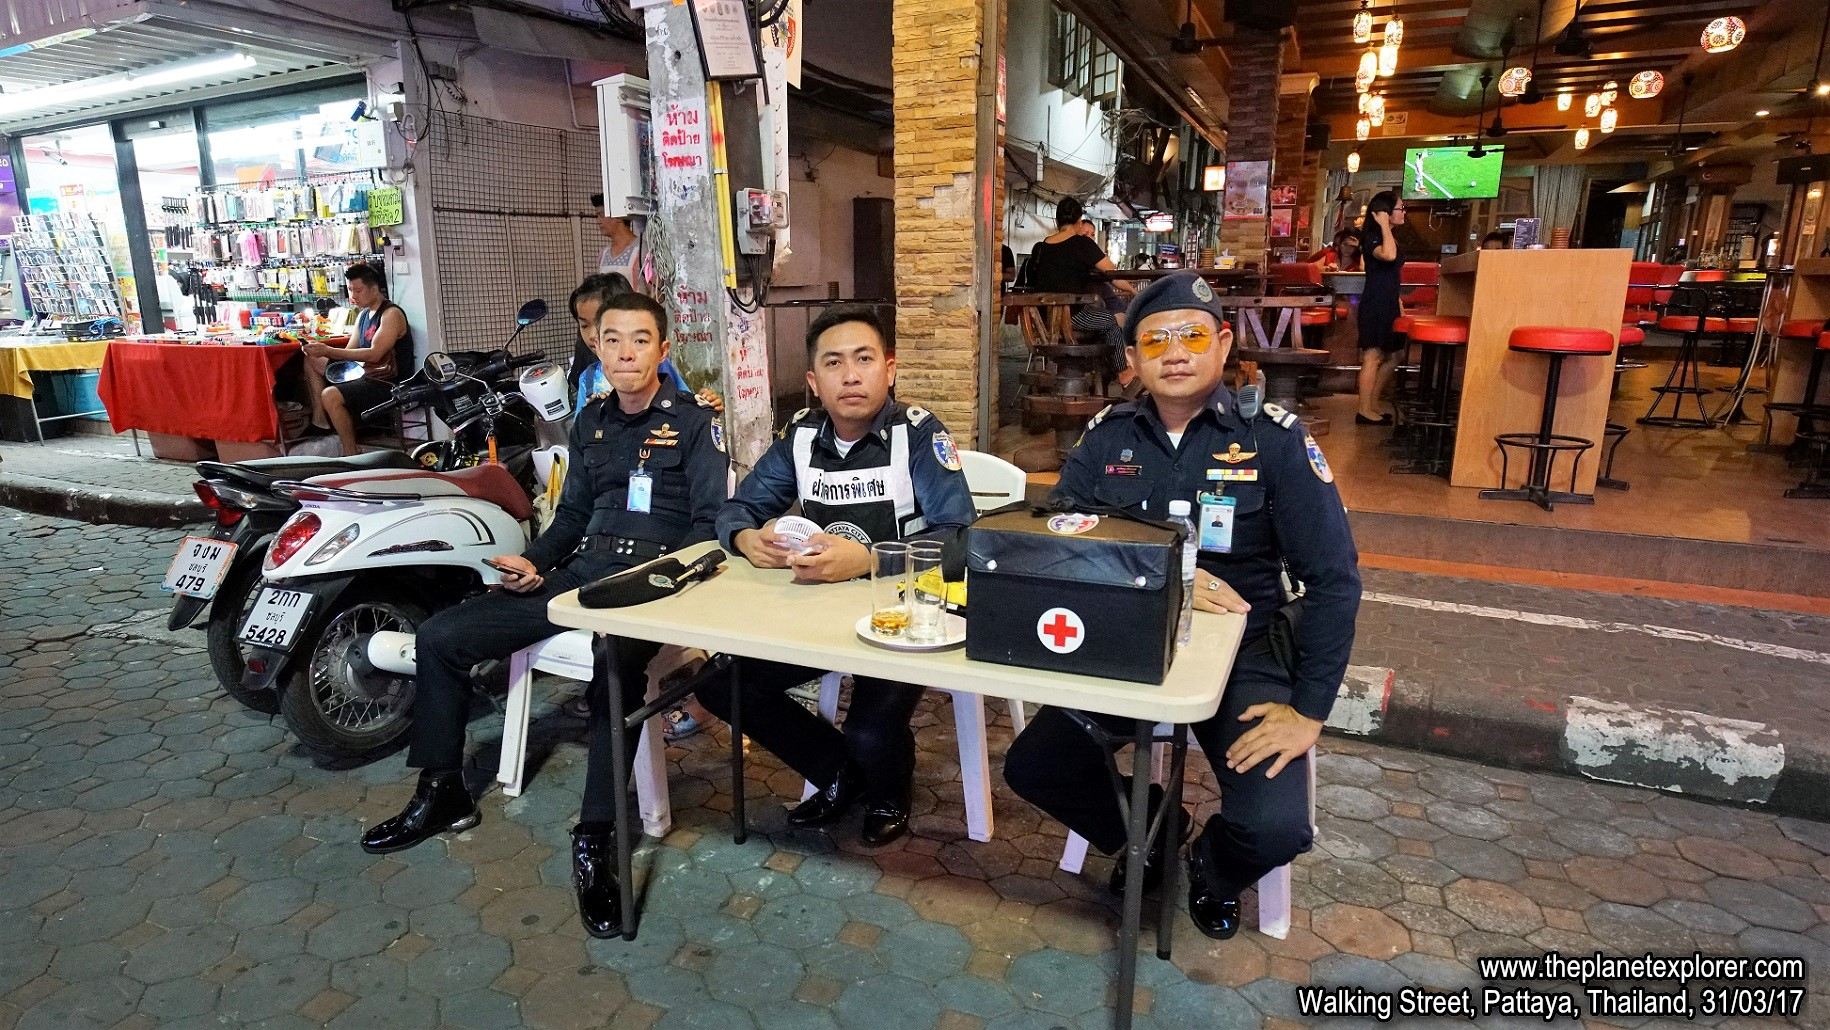 2017-03-31_1954_Thailand_Pattaya_Walking Street_Police_DSC04087_s7R2_LR_@